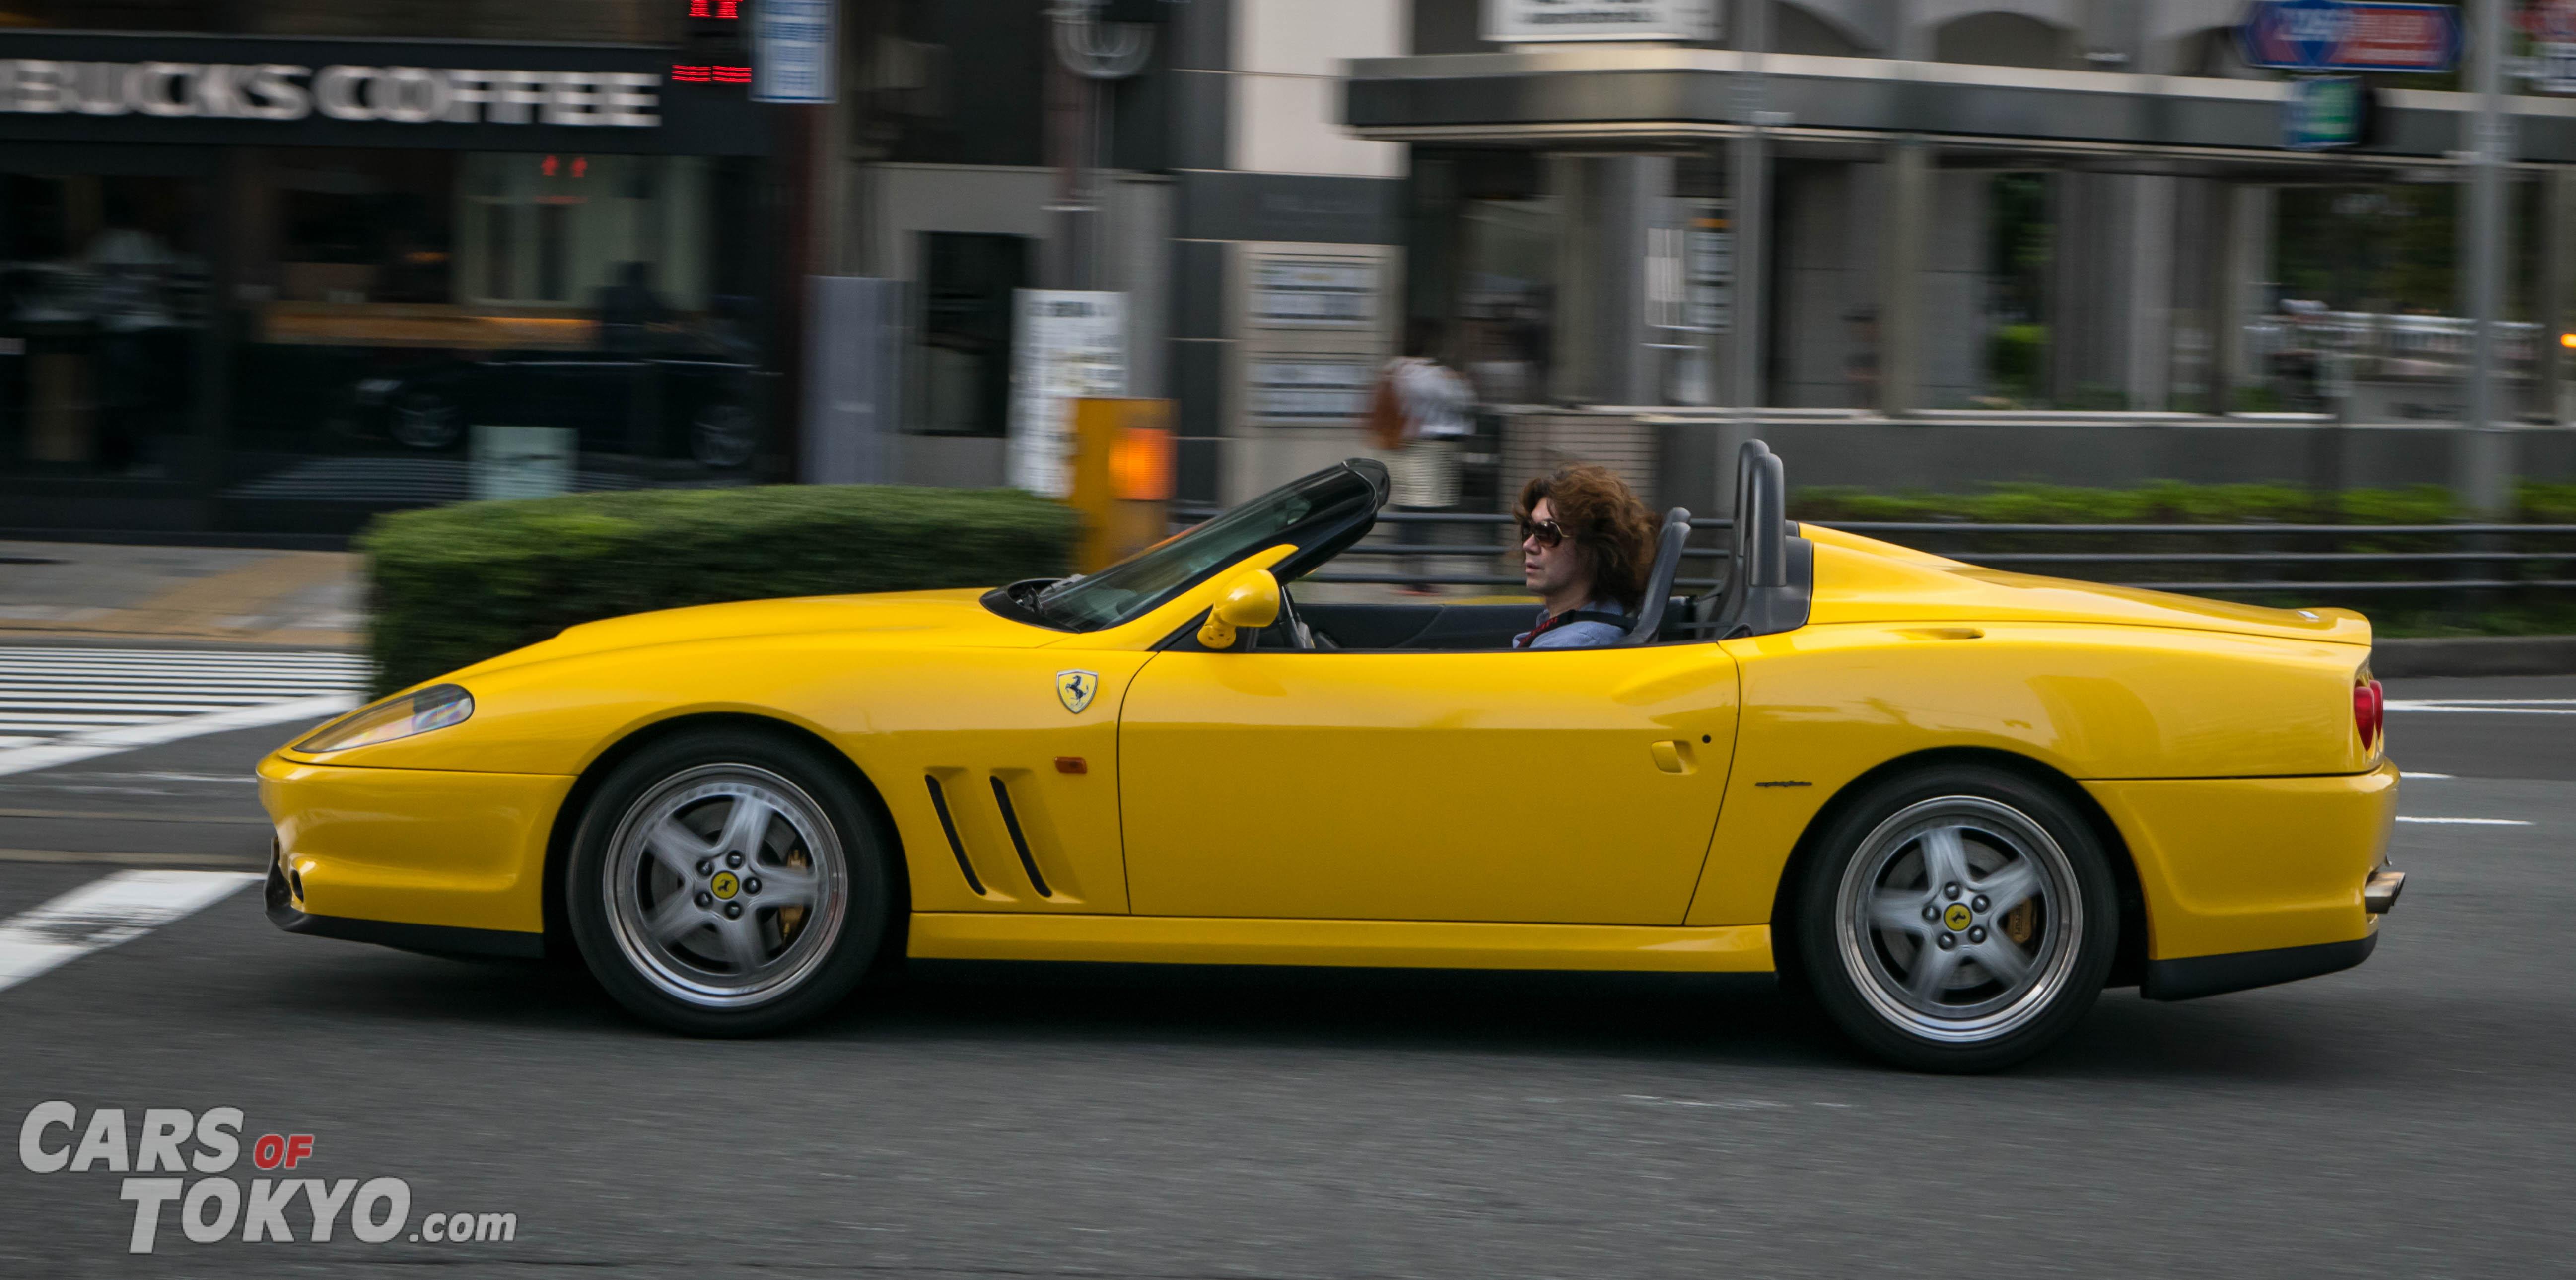 Cars of Tokyo Classic Ferrari 550 Barchetta